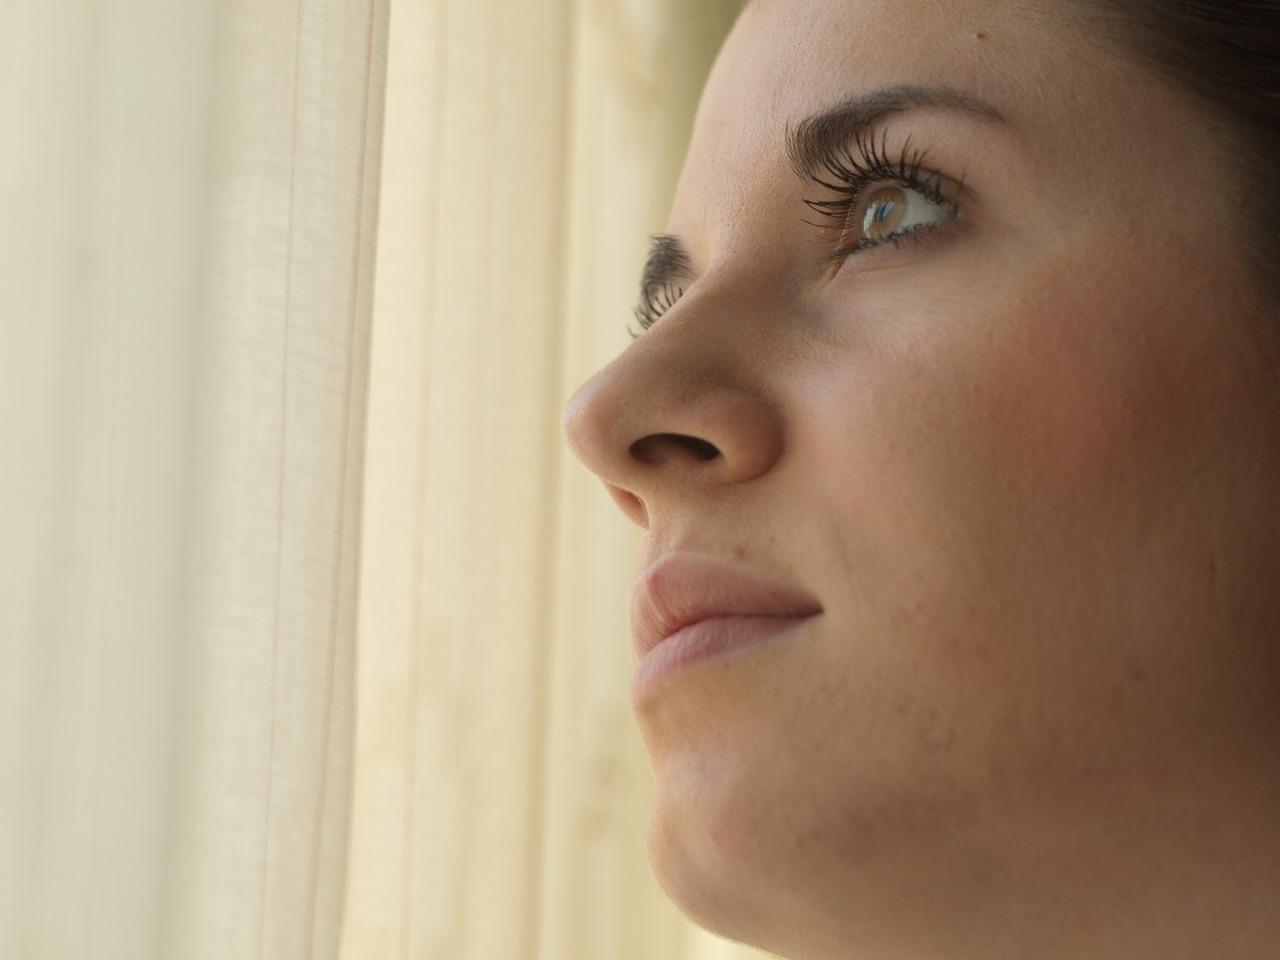 warto wiedzieć o korekcji nosa